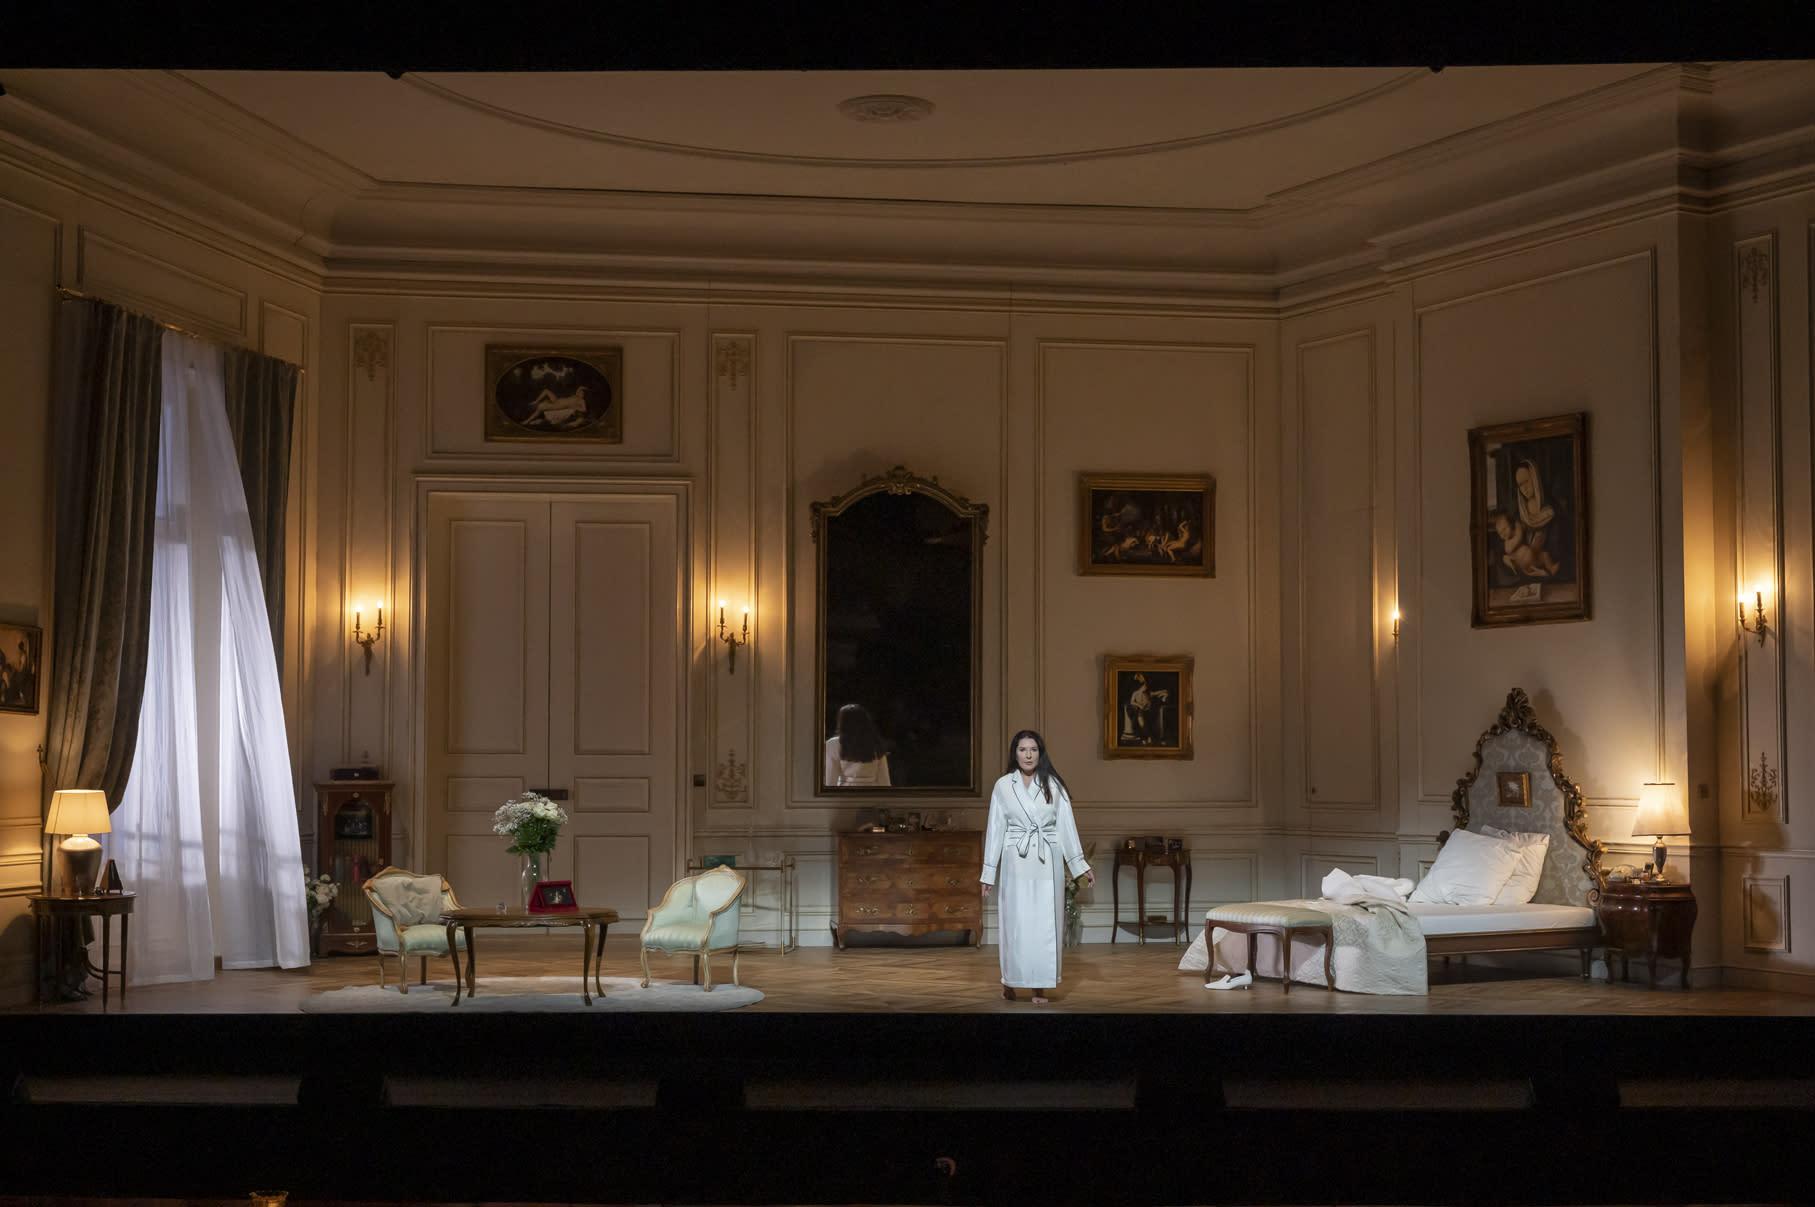 7 Deaths of Maria Callas 21-22 © Charles Duprat - OnP (10)